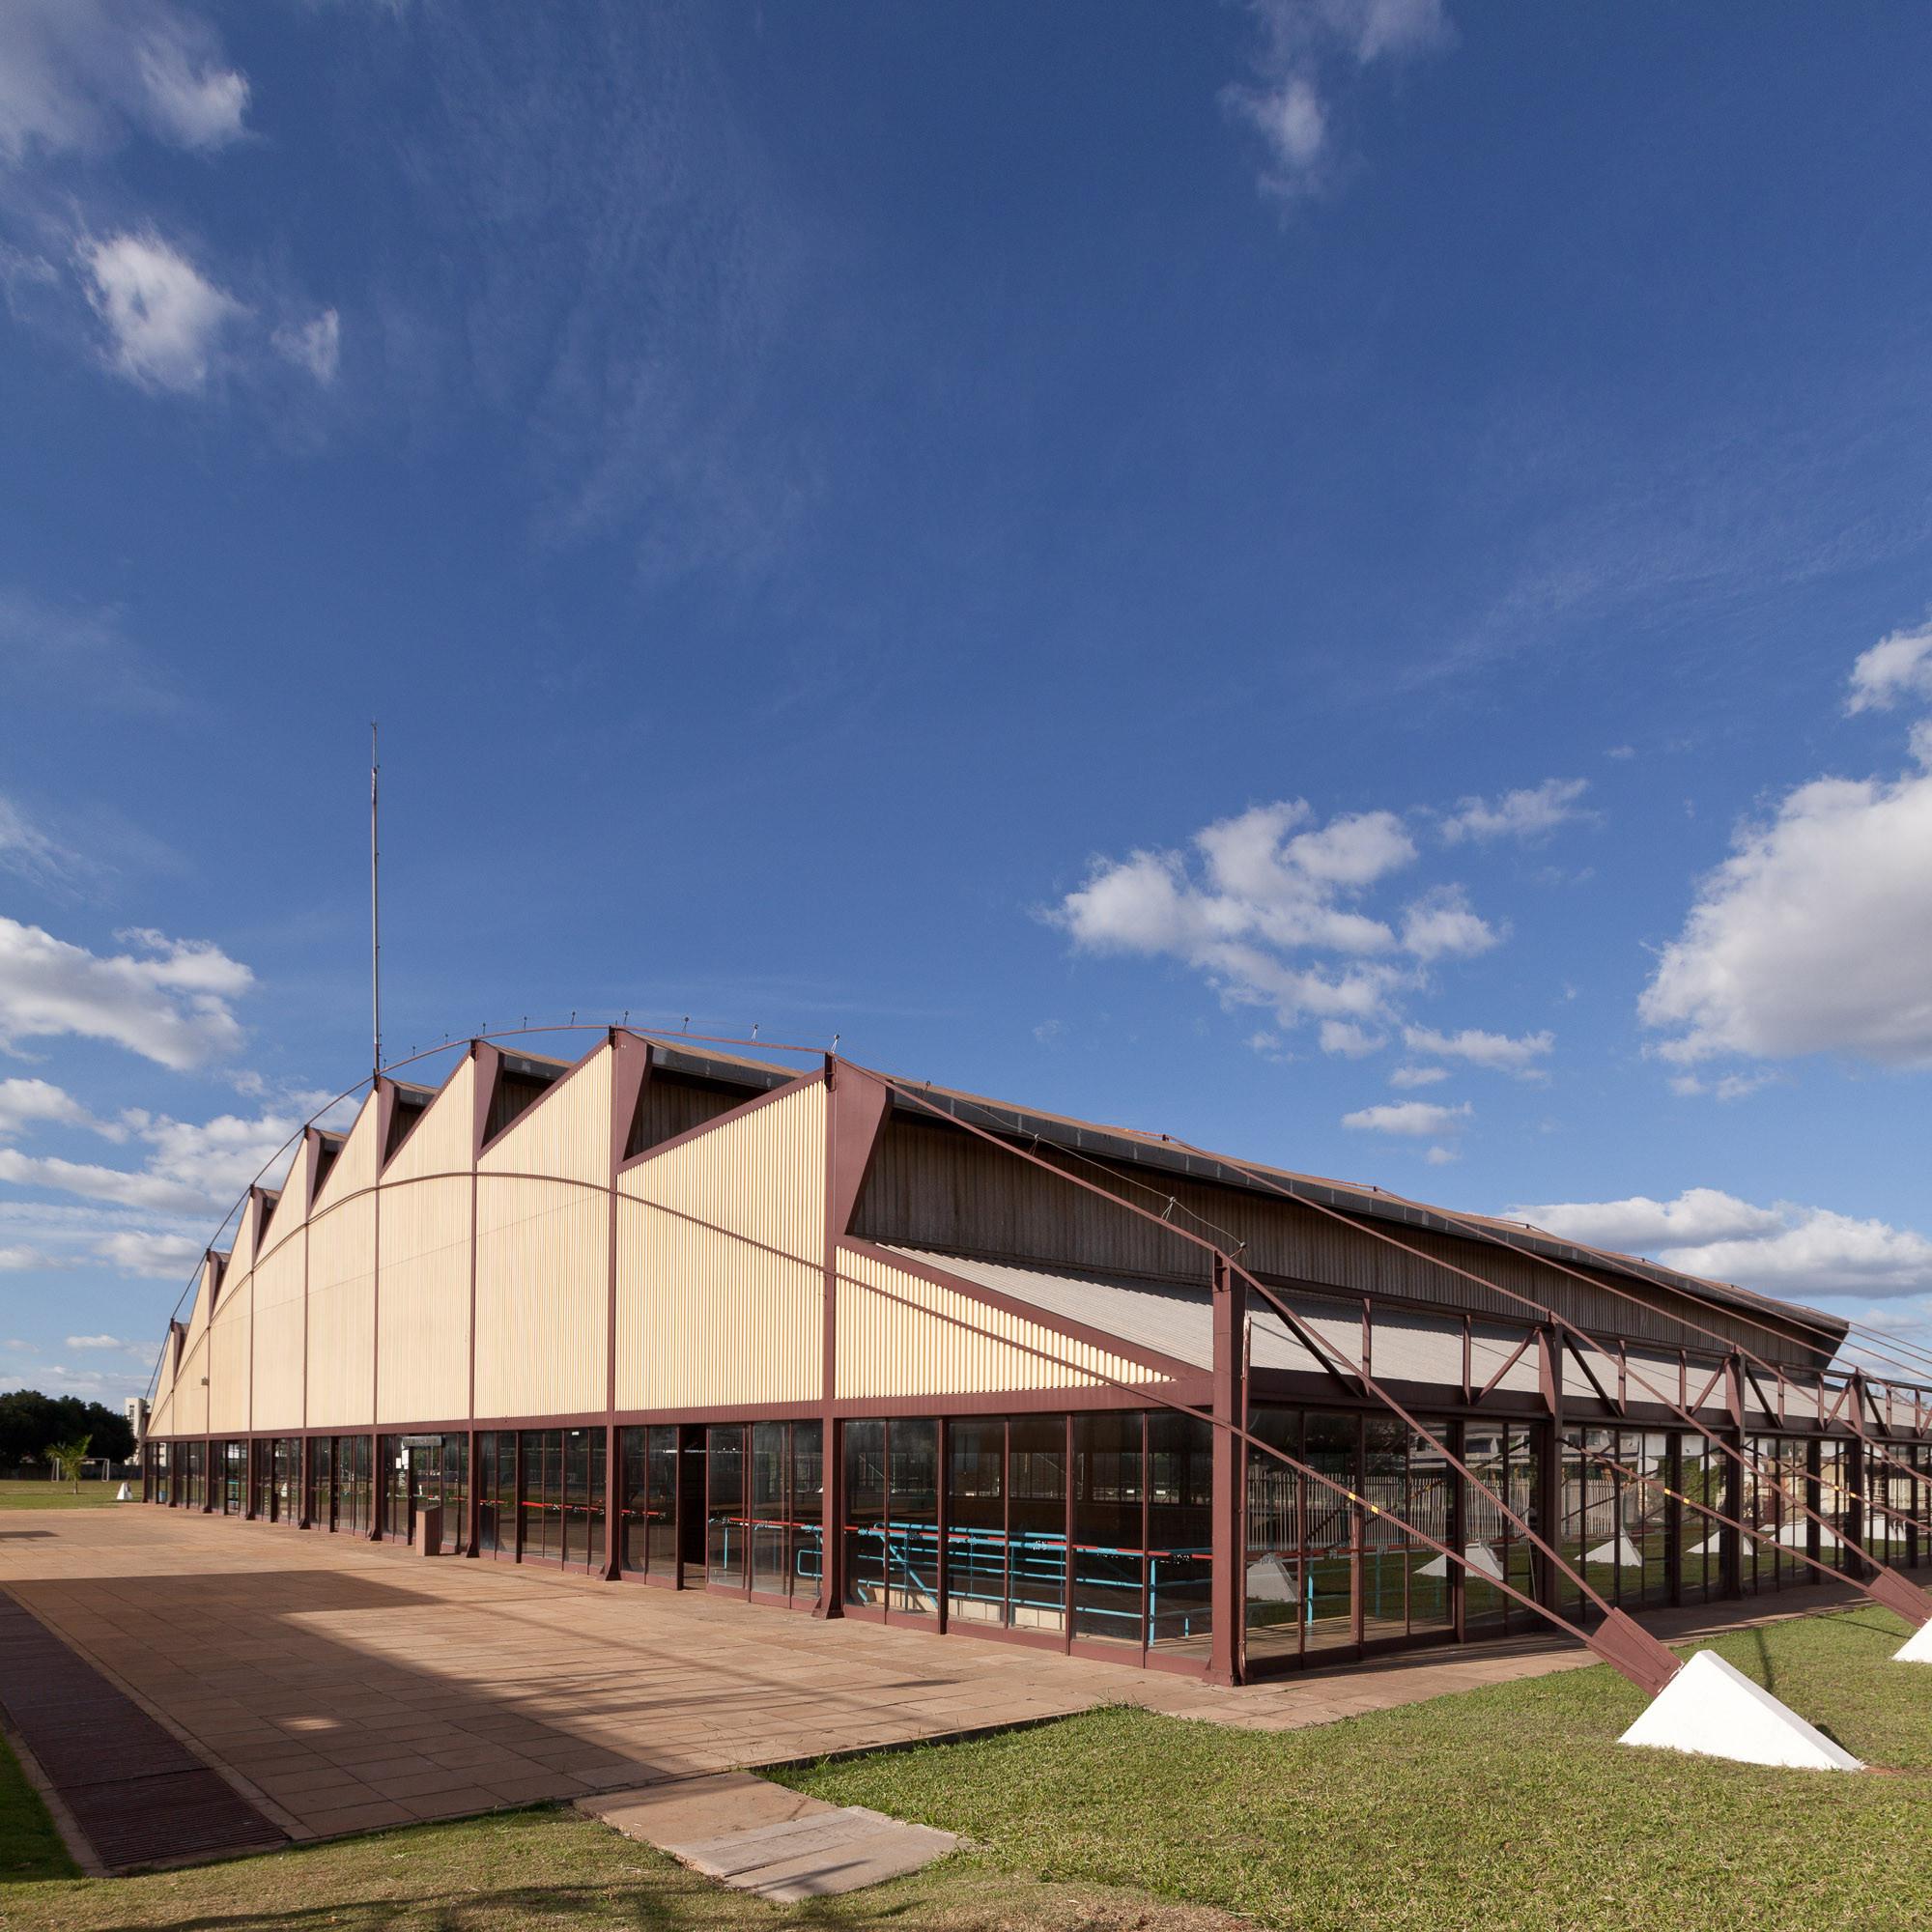 Asociación Portuguesa de Brasília © Joana França